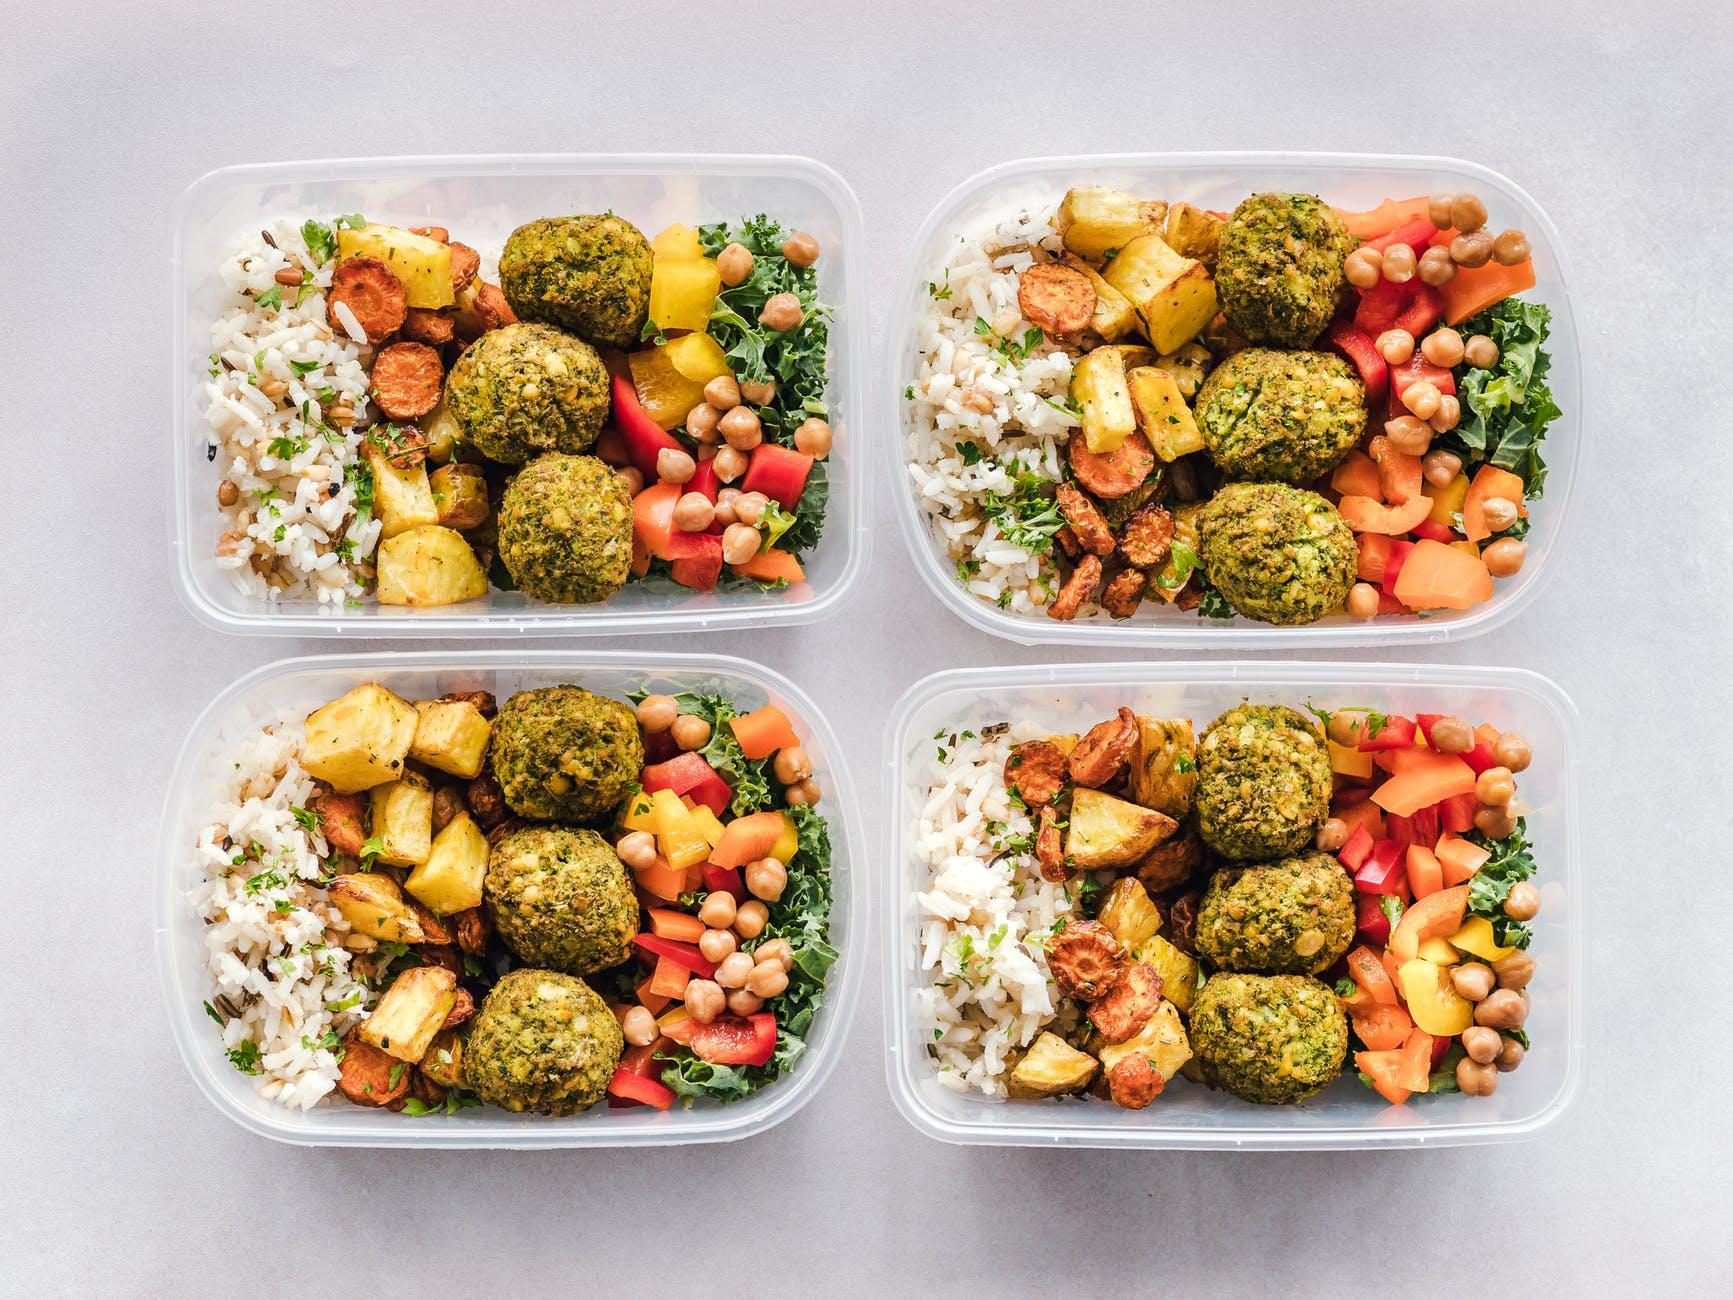 diet-by-kunal-bansal-chandigarh